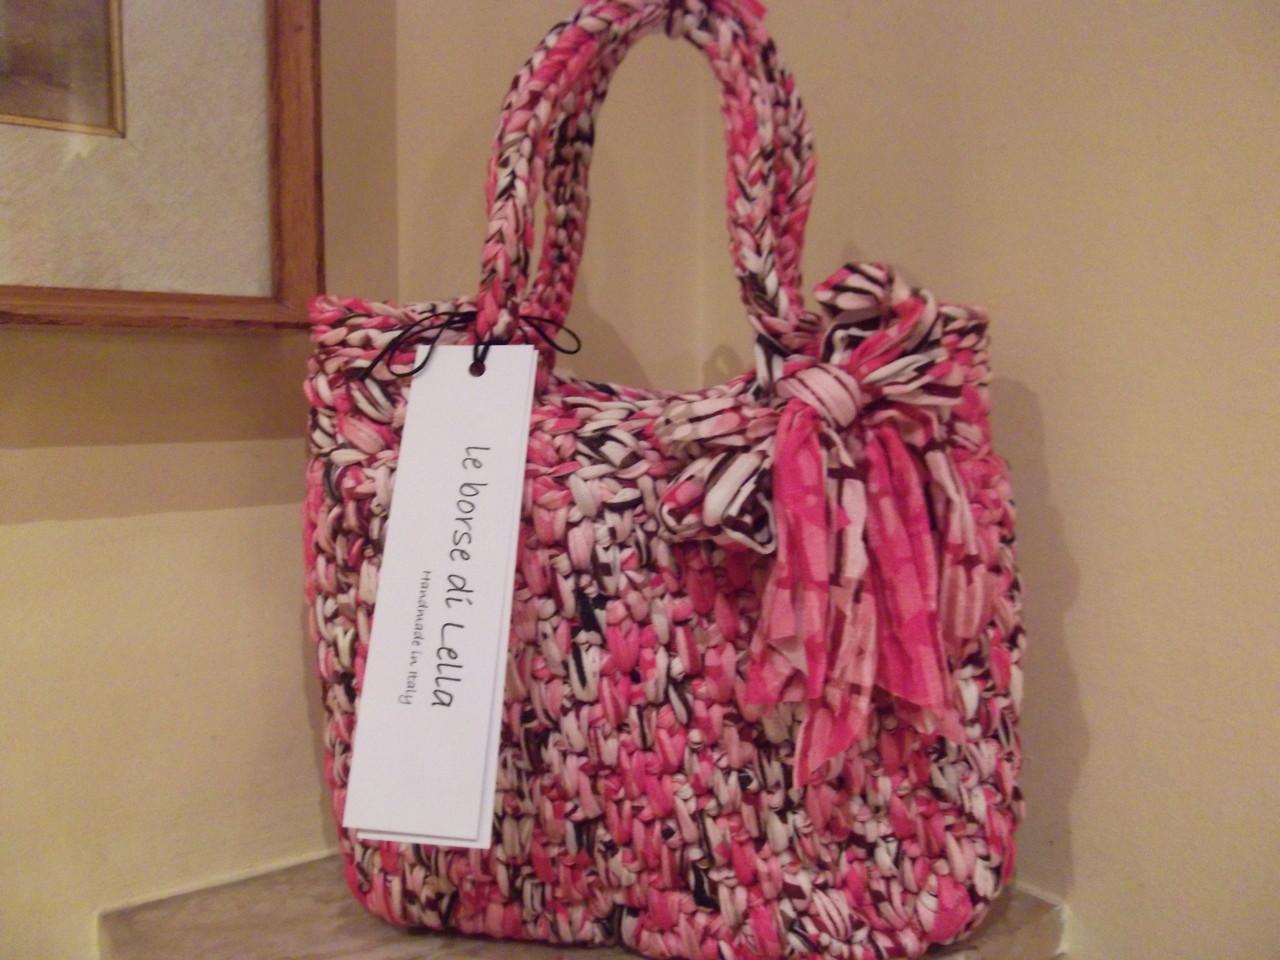 mod. 40 - fettuccia in jersey cotone - melange rosa - peso gr. 580 - EURO 50,00